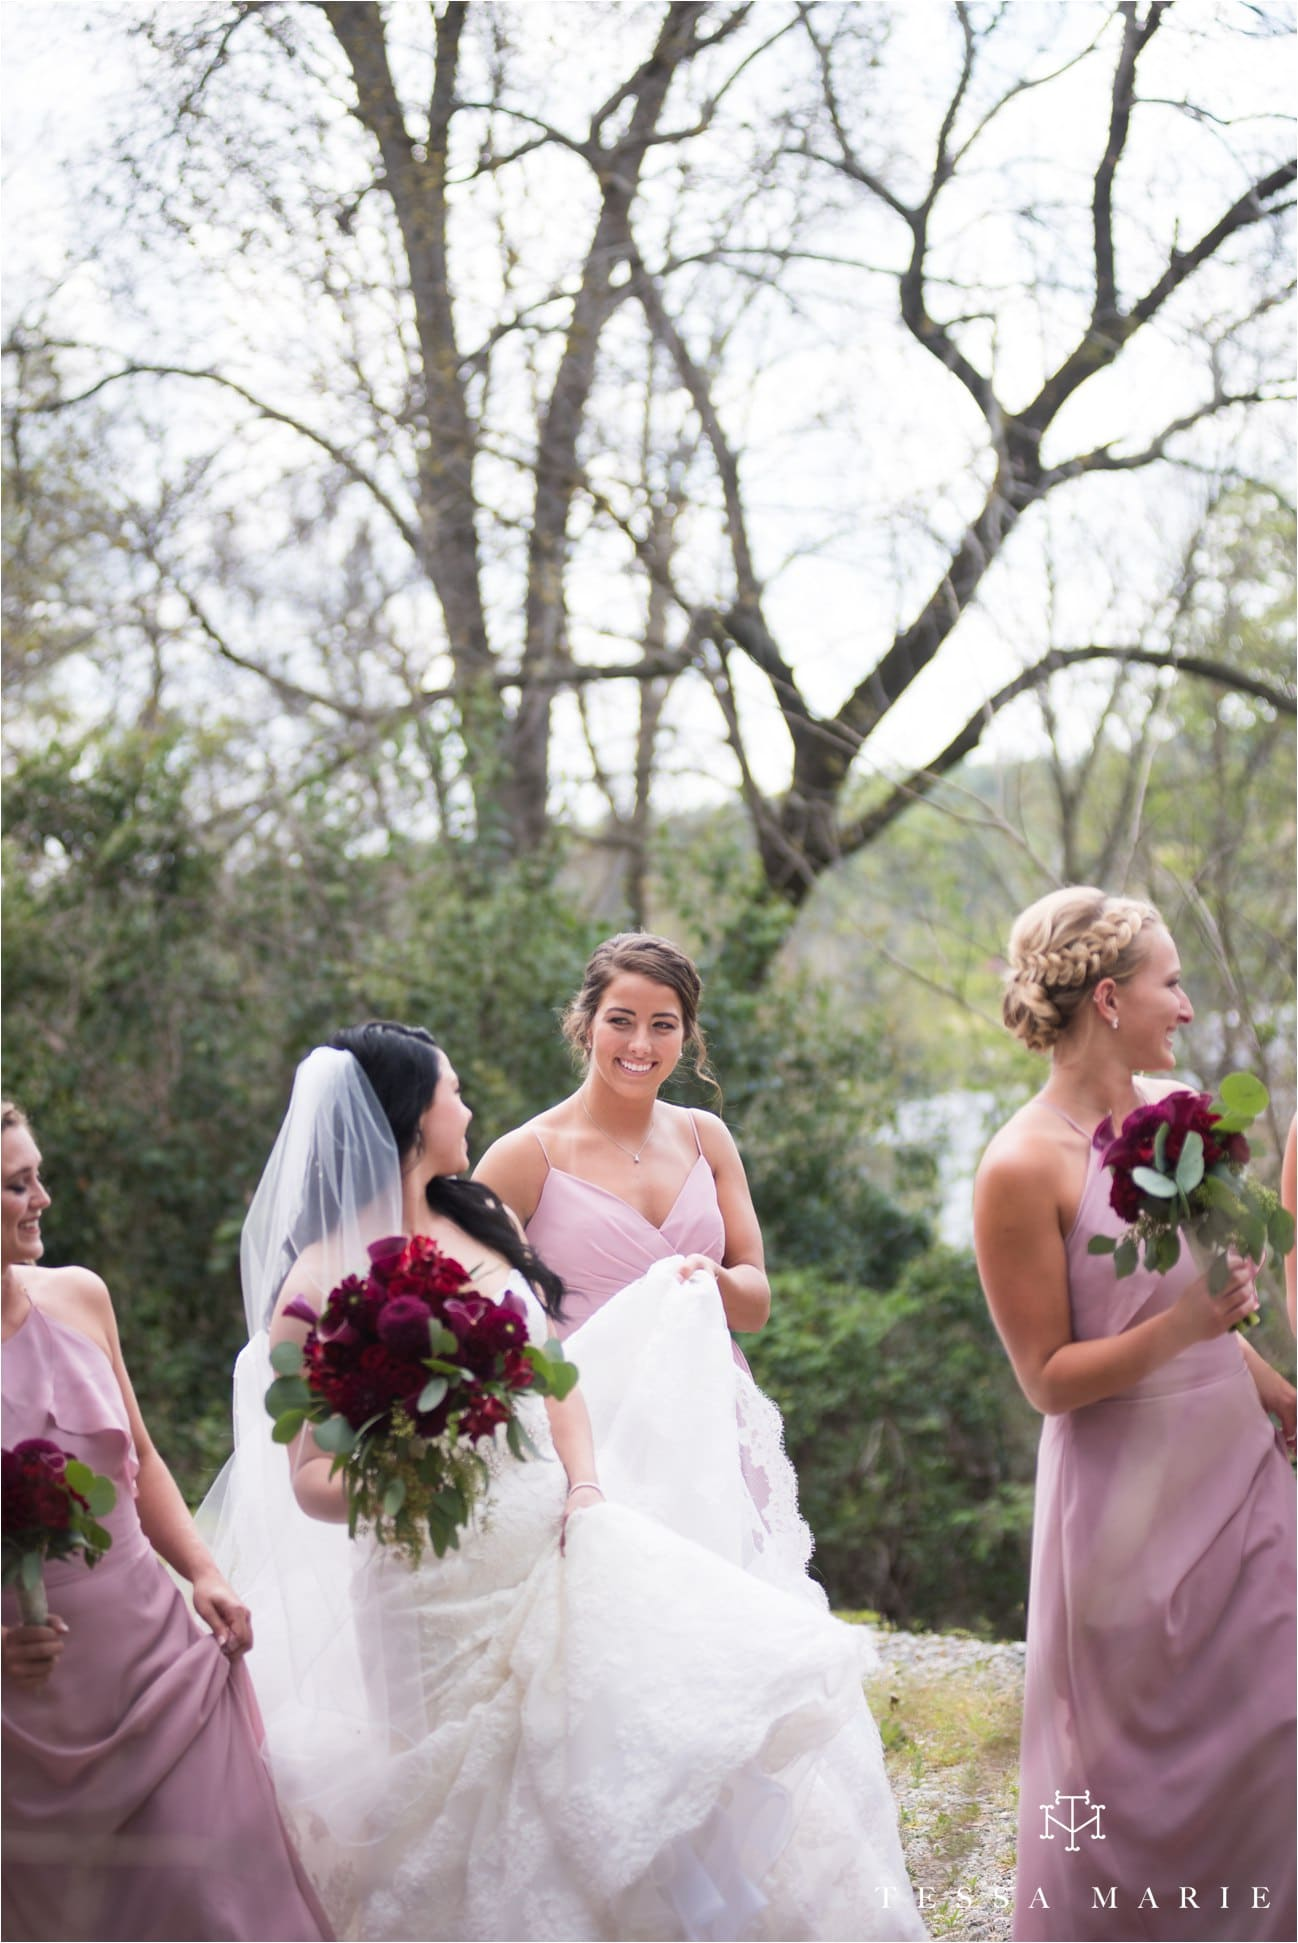 tessa_marie_weddings_rivermill_event_centere_candid_outdoor_wedding_photos_0061